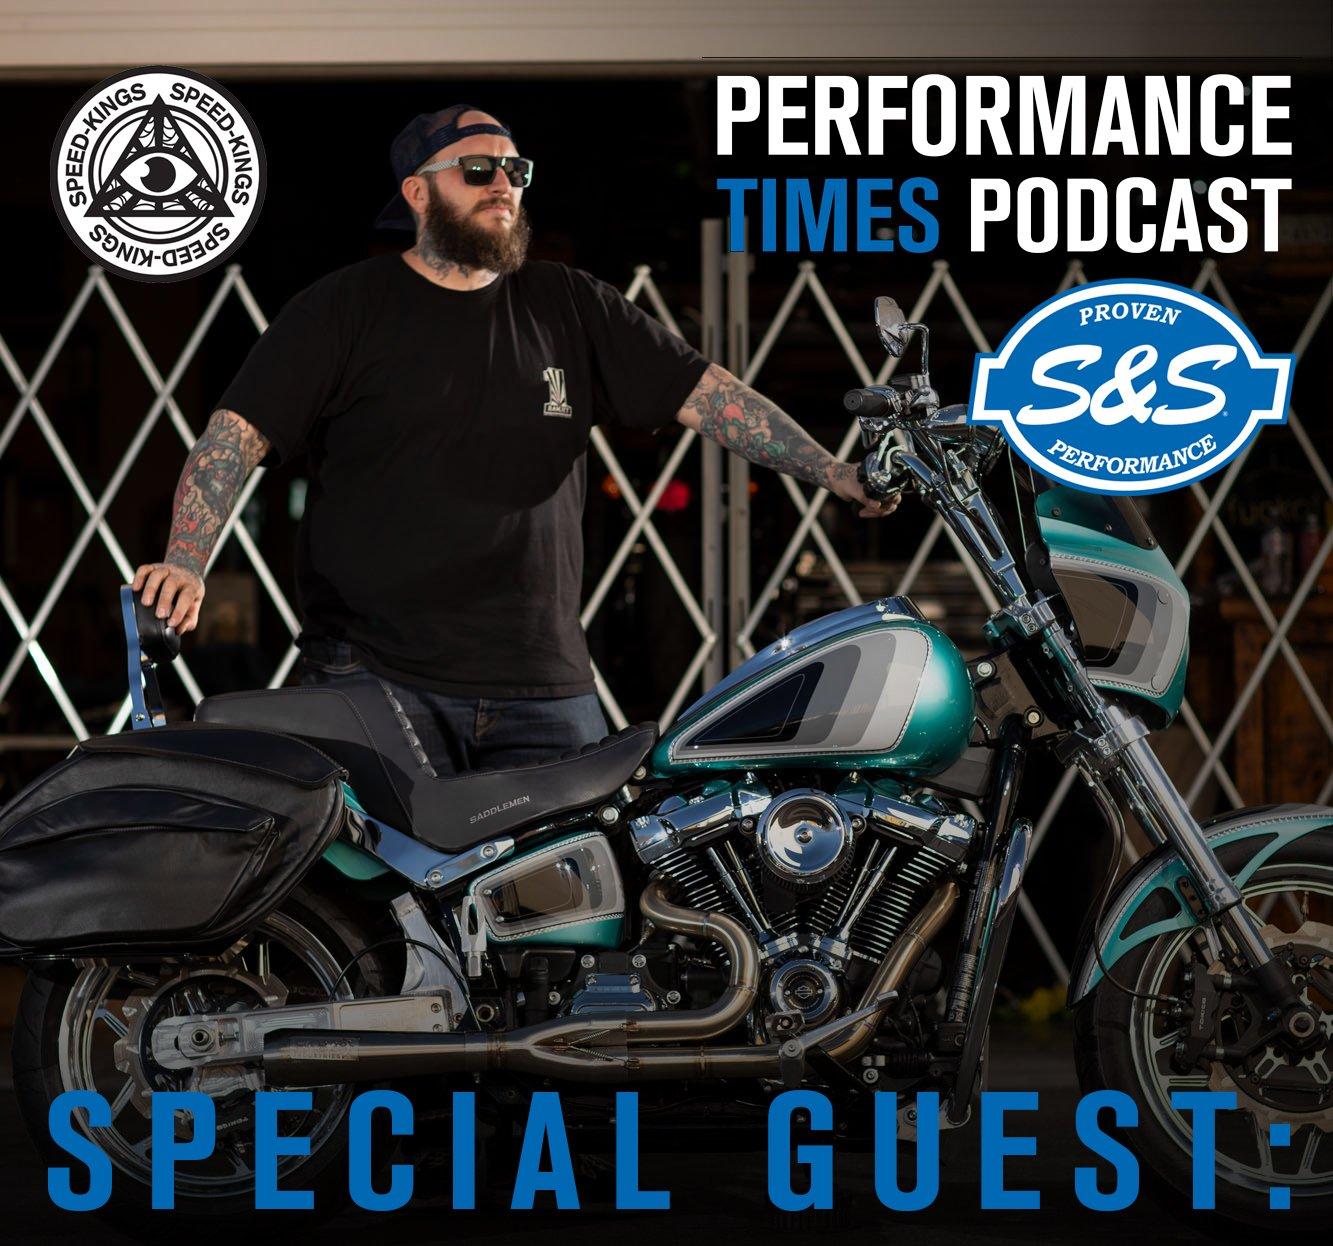 speedkings podcast graphic